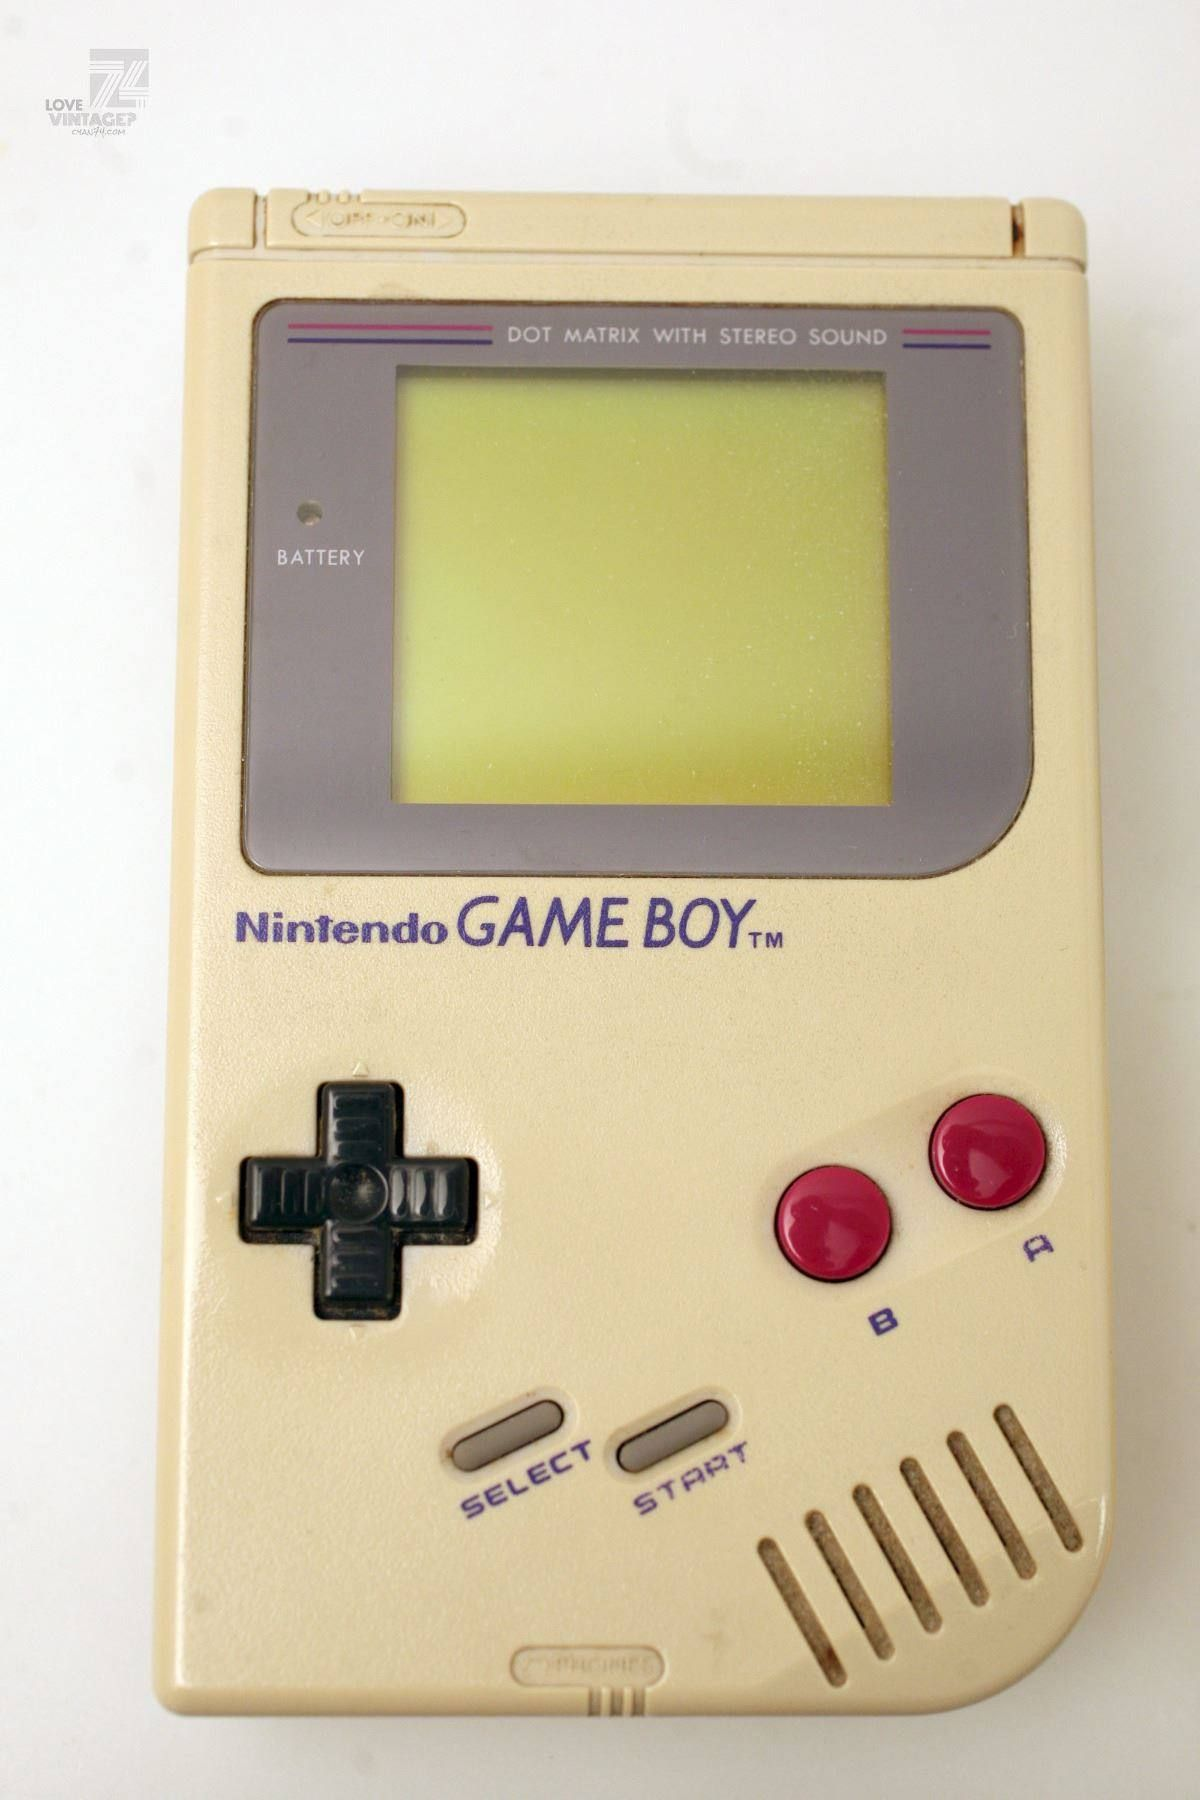 cyan74.com - vintage & pop culture | Nintendo Game Boy Classic